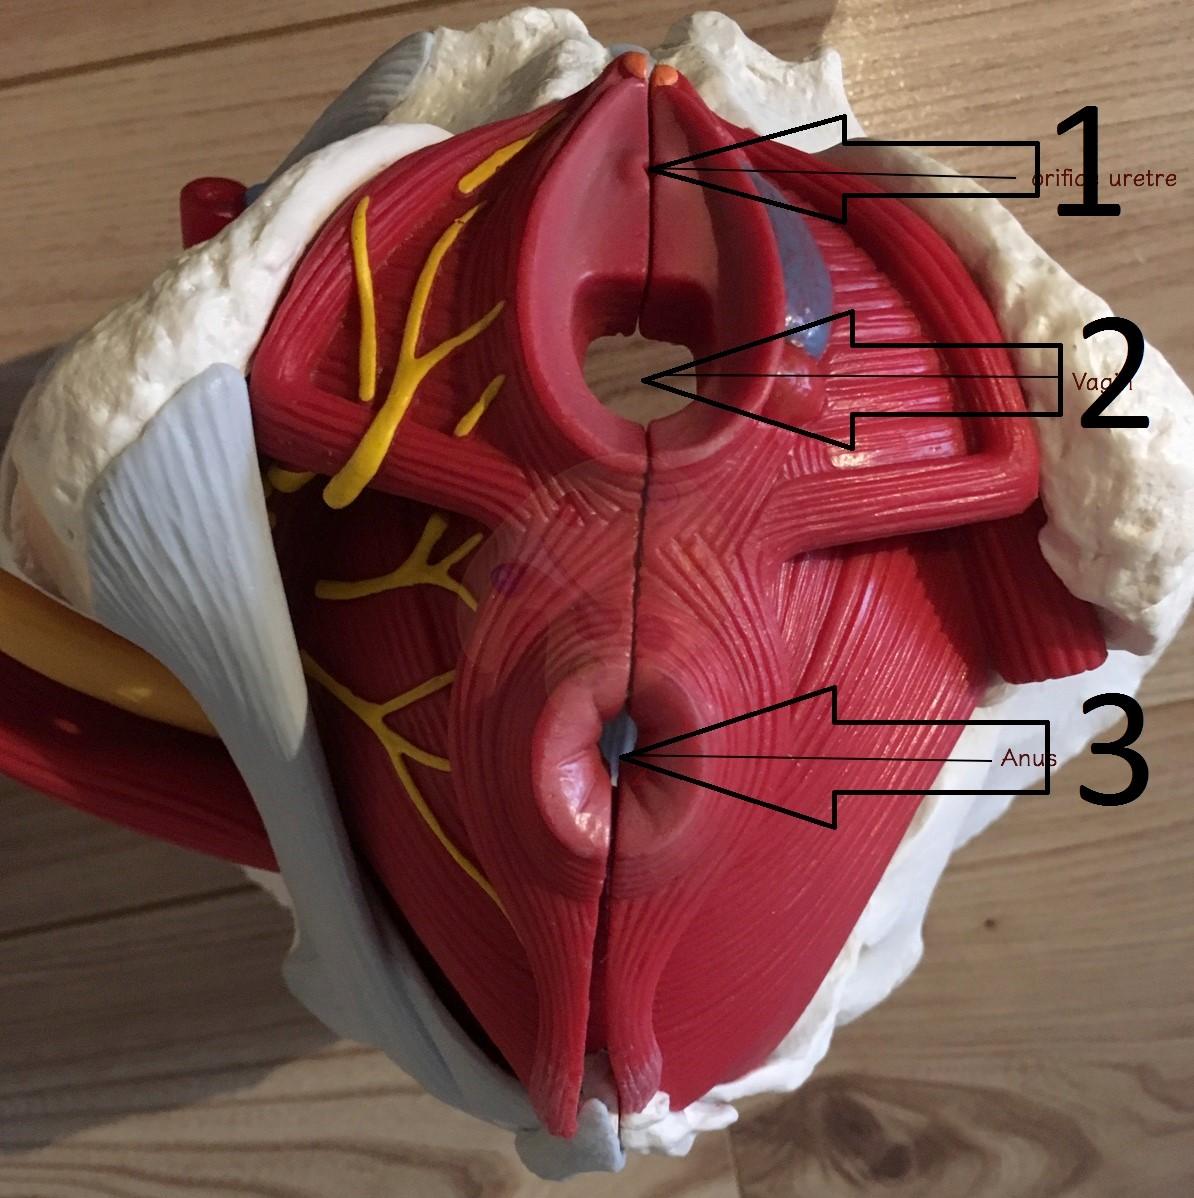 Pelvic floor muscles view from below